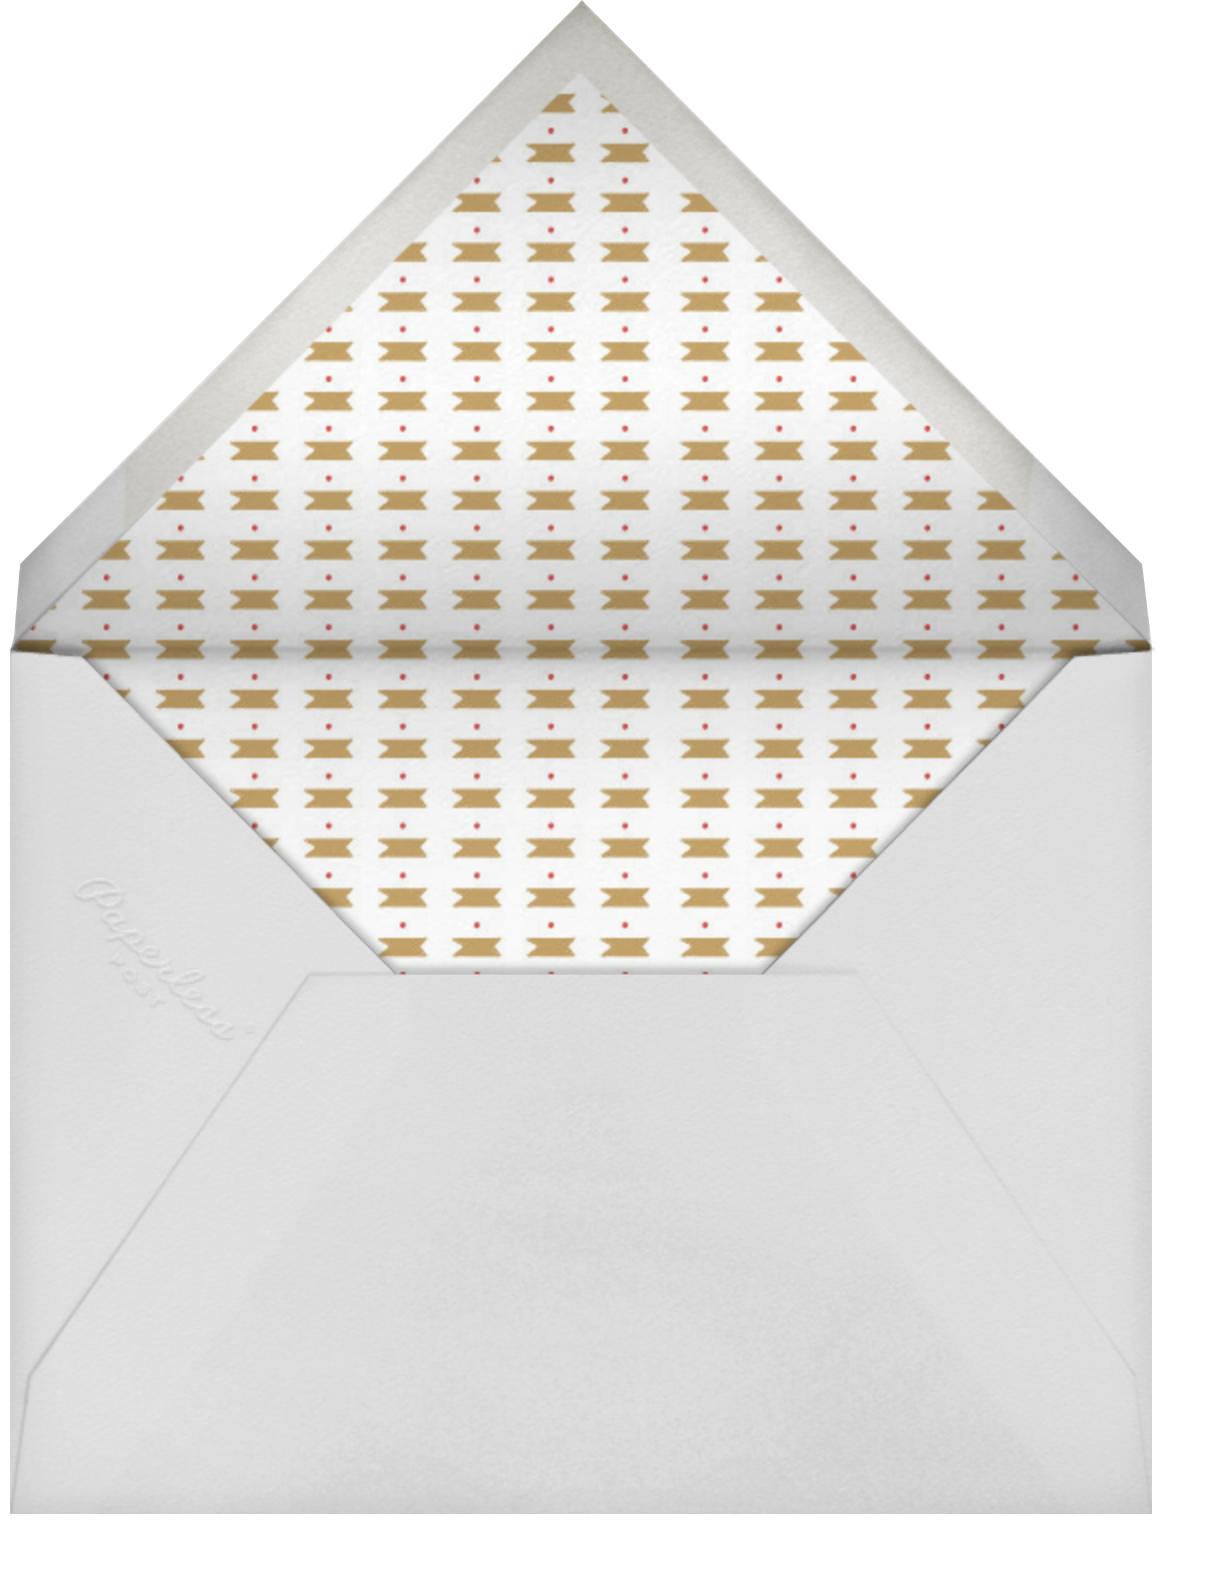 Paul Revere's Handkerchief - Dark Blue - Mr. Boddington's Studio - Envelope